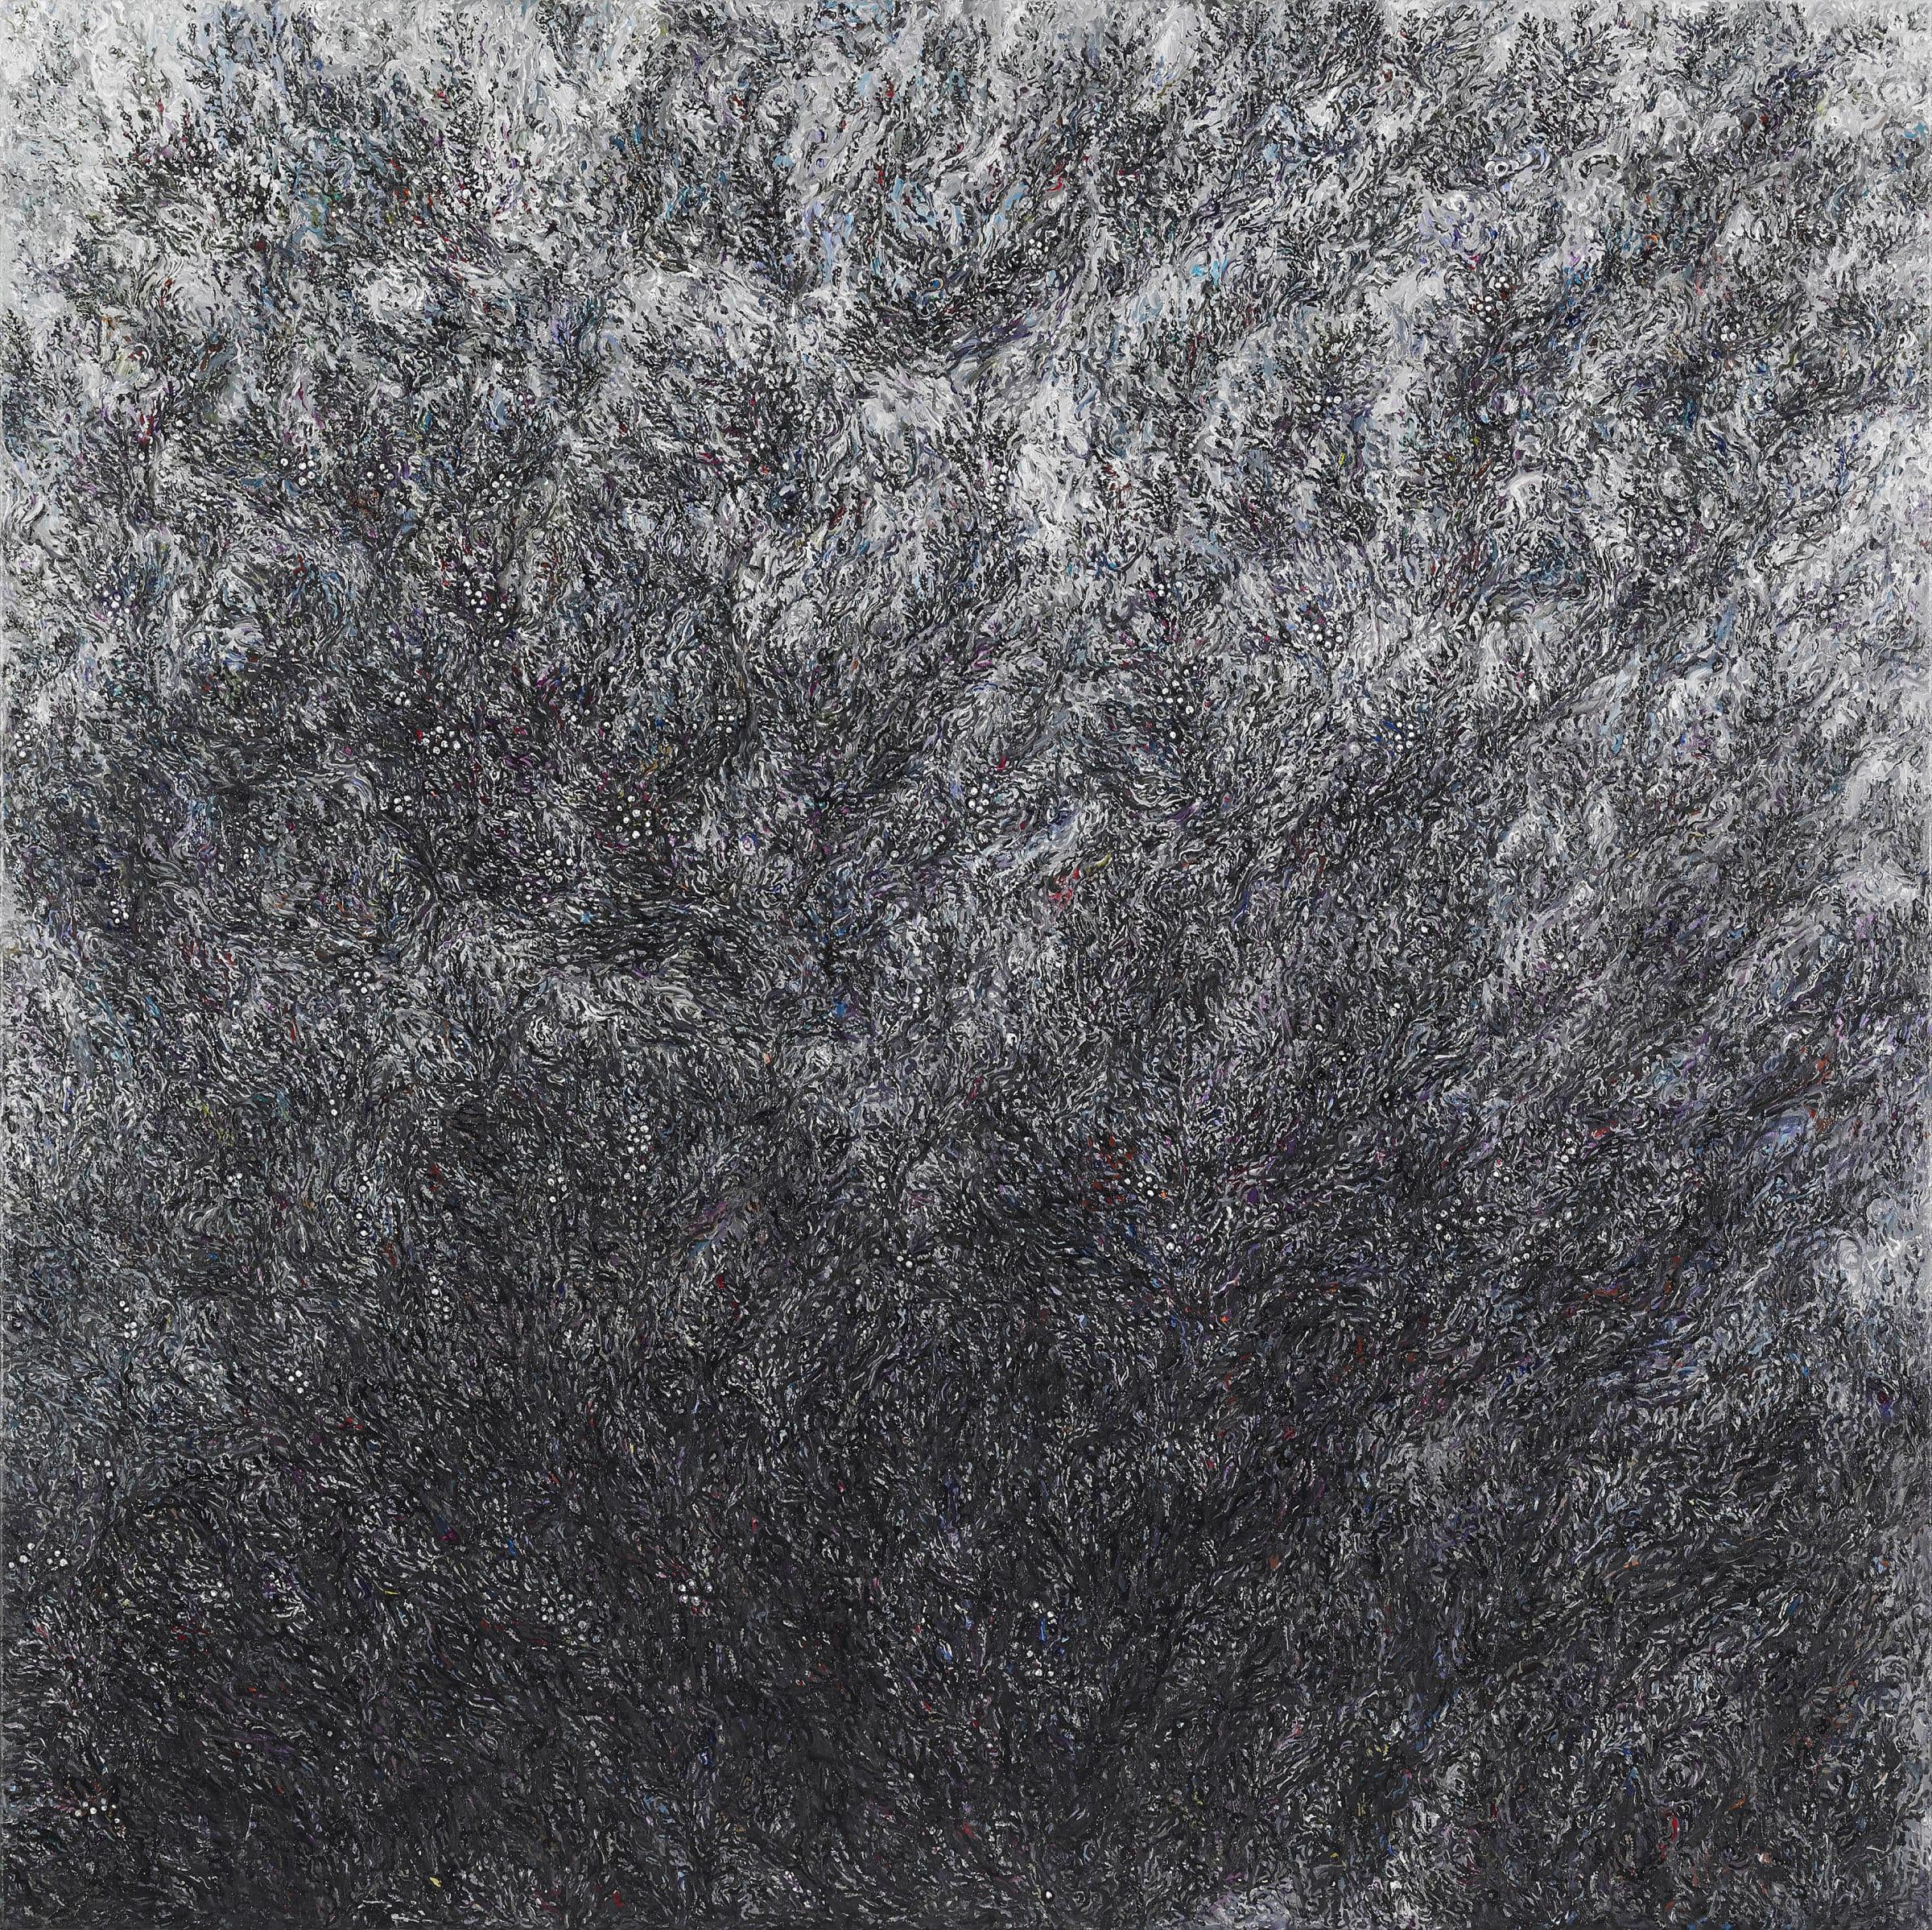 "<span class=""link fancybox-details-link""><a href=""/artists/136-eggert-petursson/works/10600/"">View Detail Page</a></span><div class=""artist""><strong>EGGERT PÉTURSSON</strong></div> <div class=""title""><em>Untitled</em>, 2011-2014</div> <div class=""medium"">oil on canvas</div> <div class=""dimensions"">100 x 100 cm</div>"